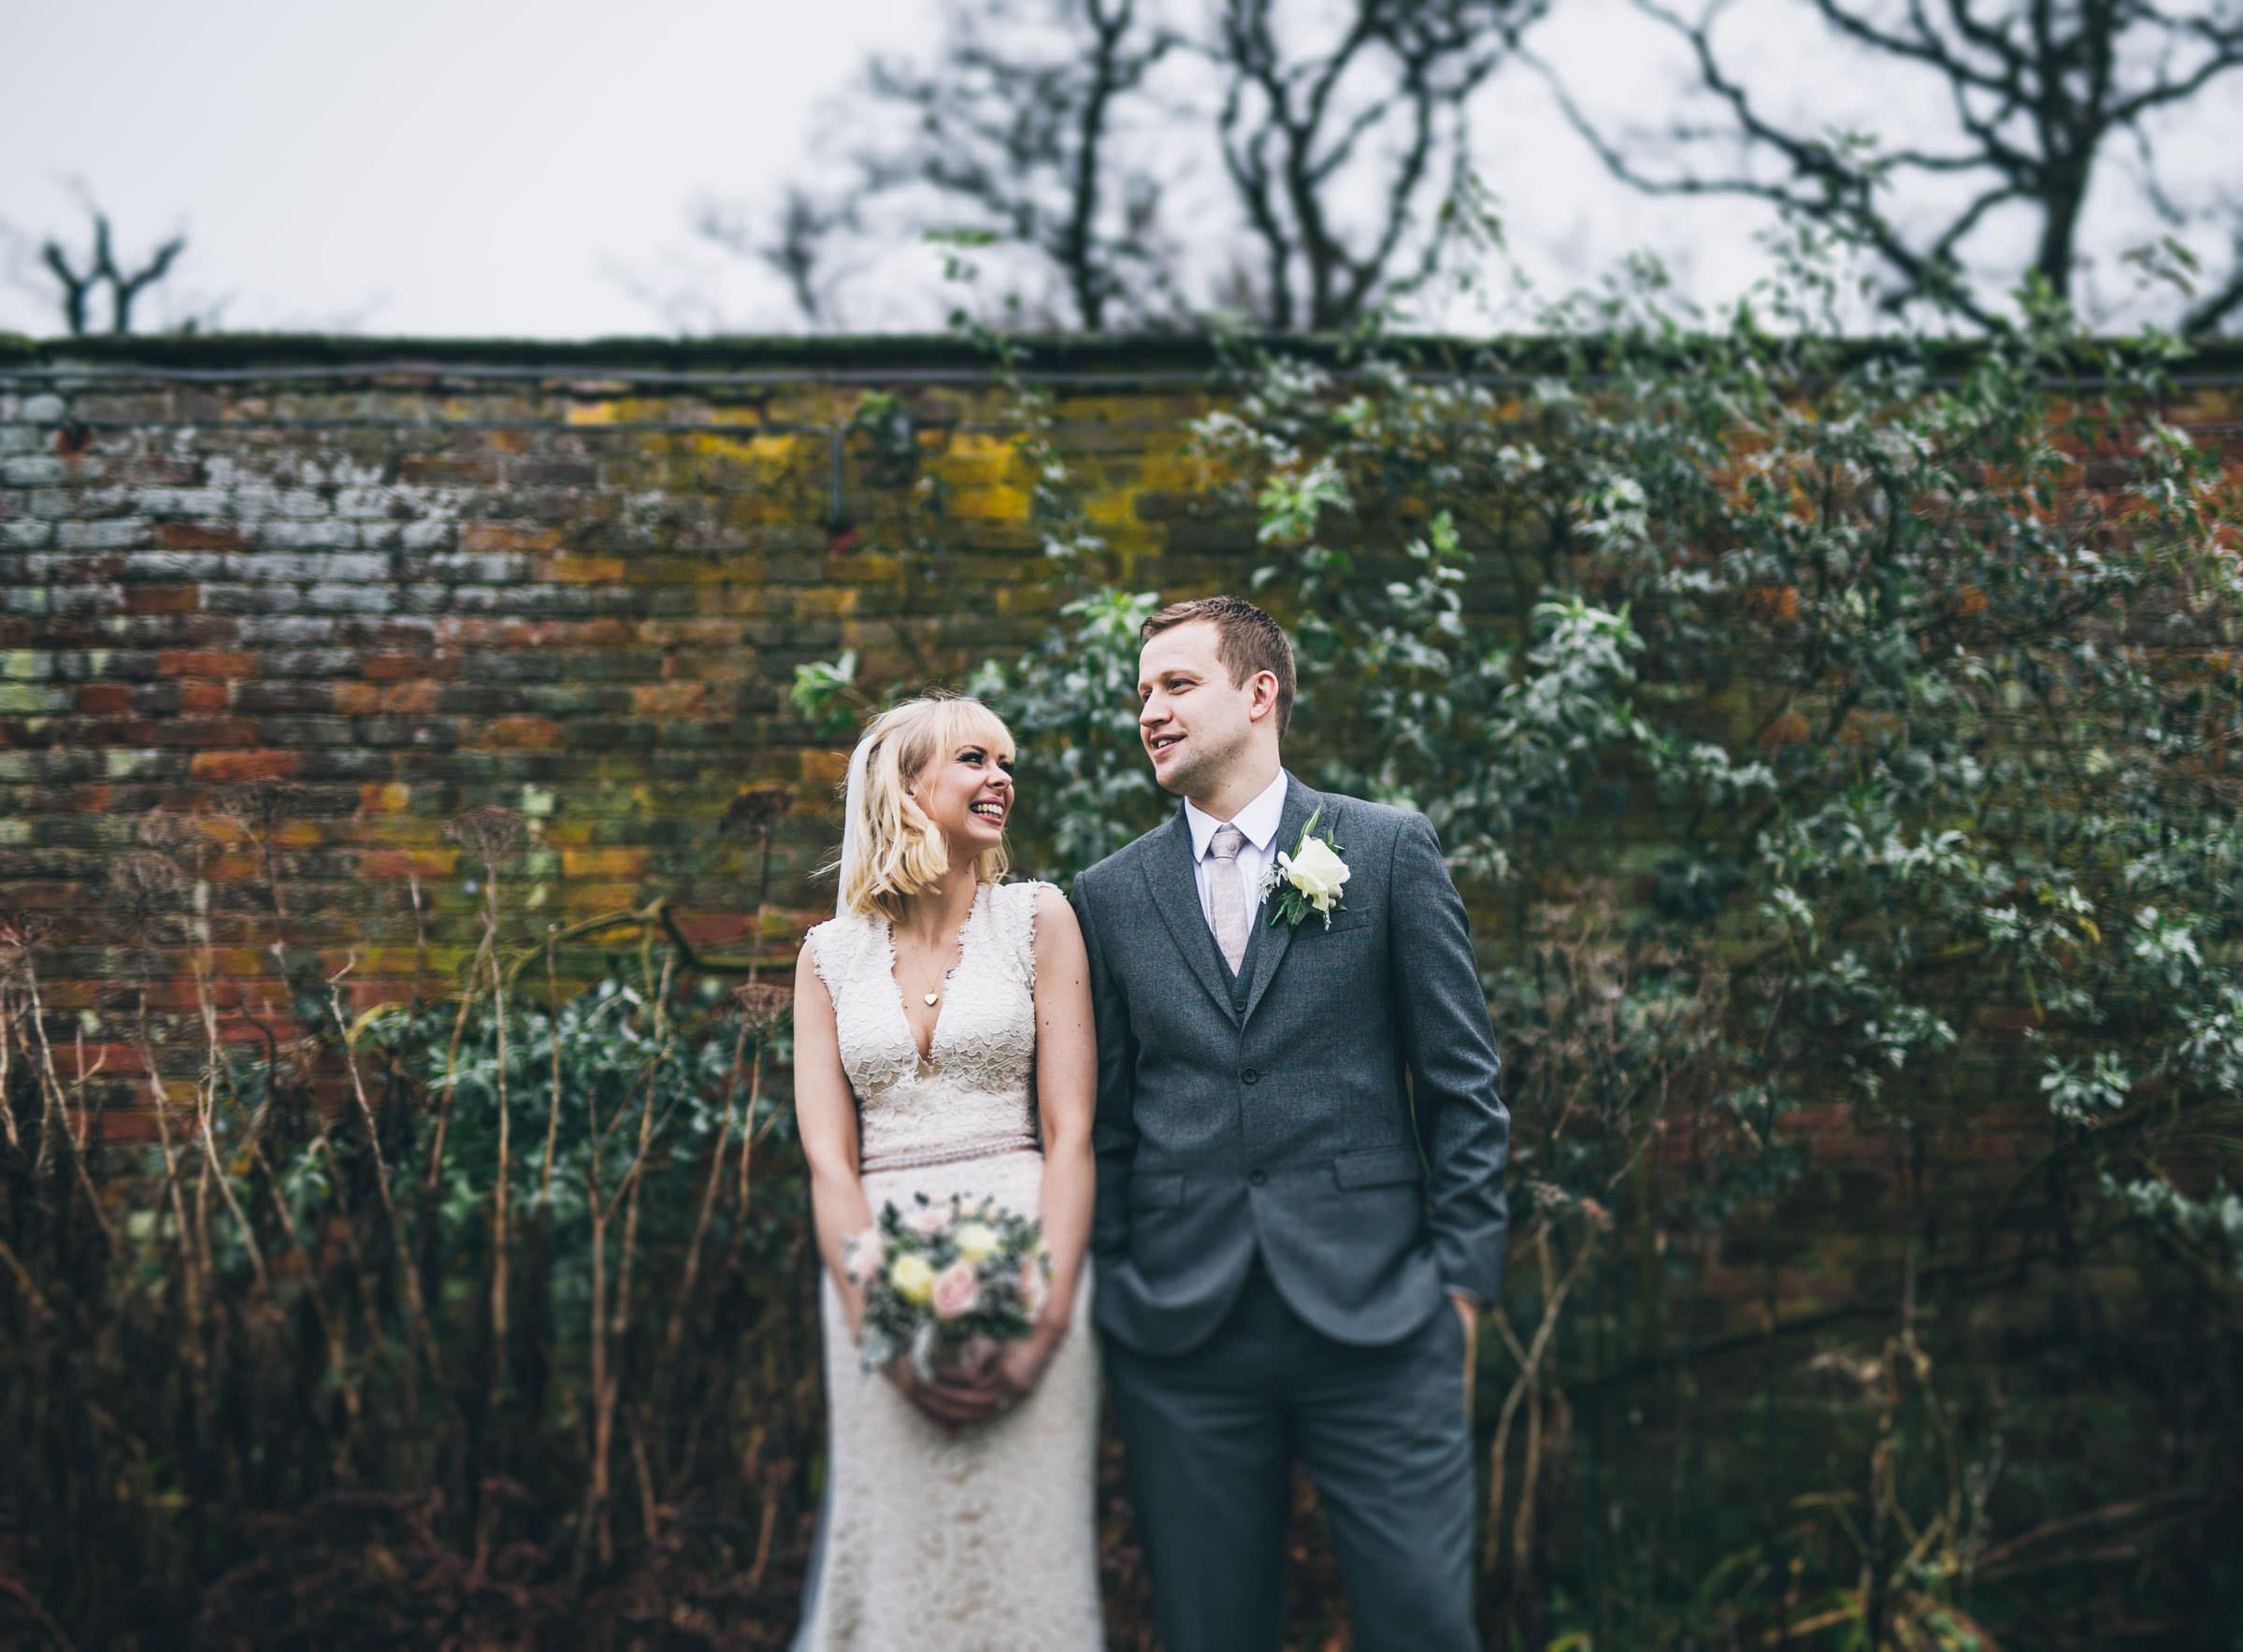 stylish wedding couple at Combermere Abbey Shropshire